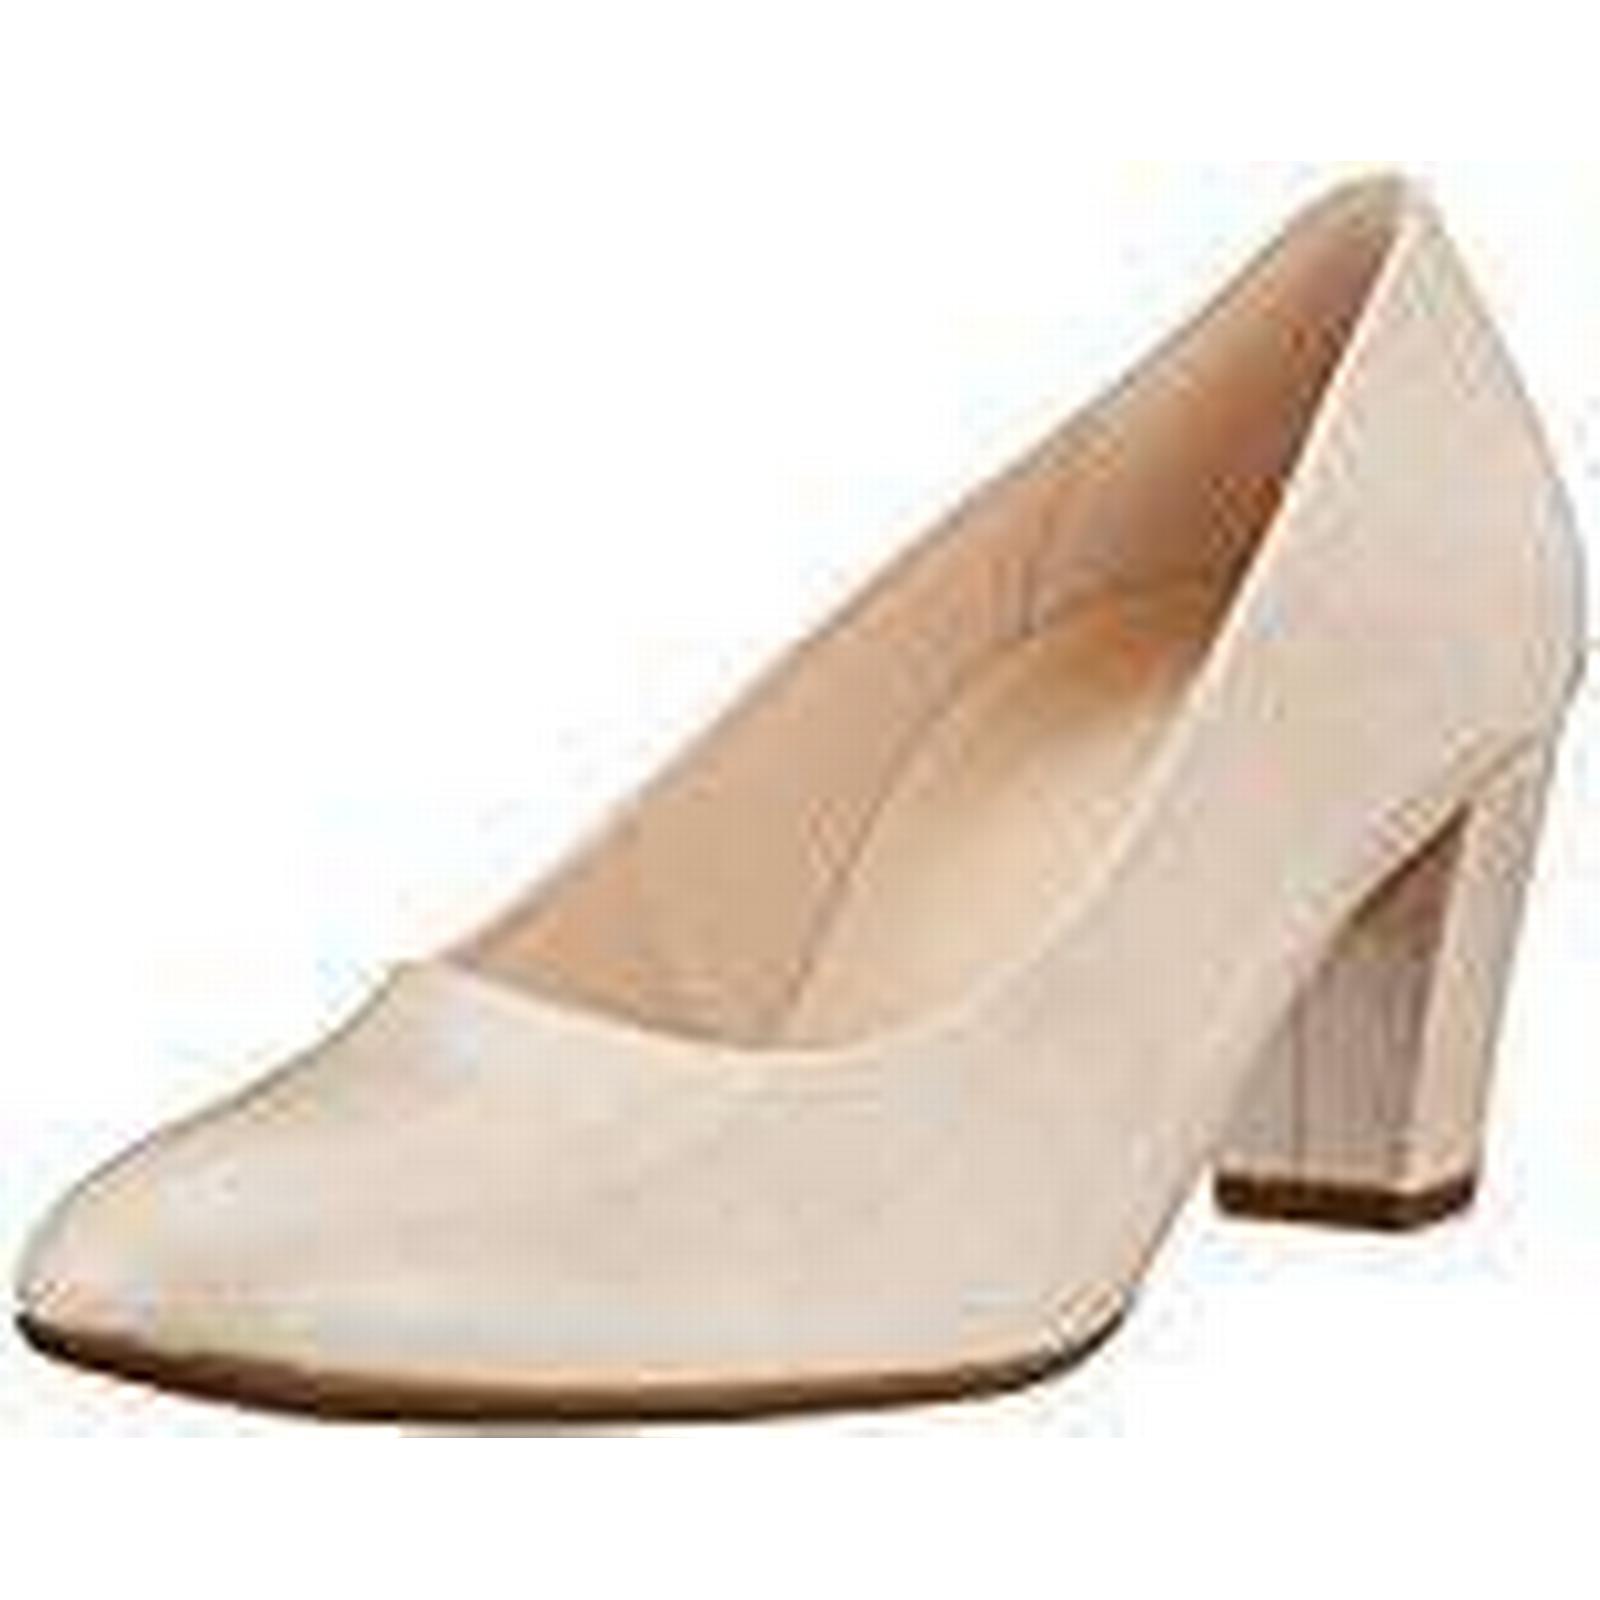 Gabor Toe Women's Comfort Fashion Closed Toe Gabor Heels, Beige Sand 82, 7.5 UK 7.5 UK 7a28c1